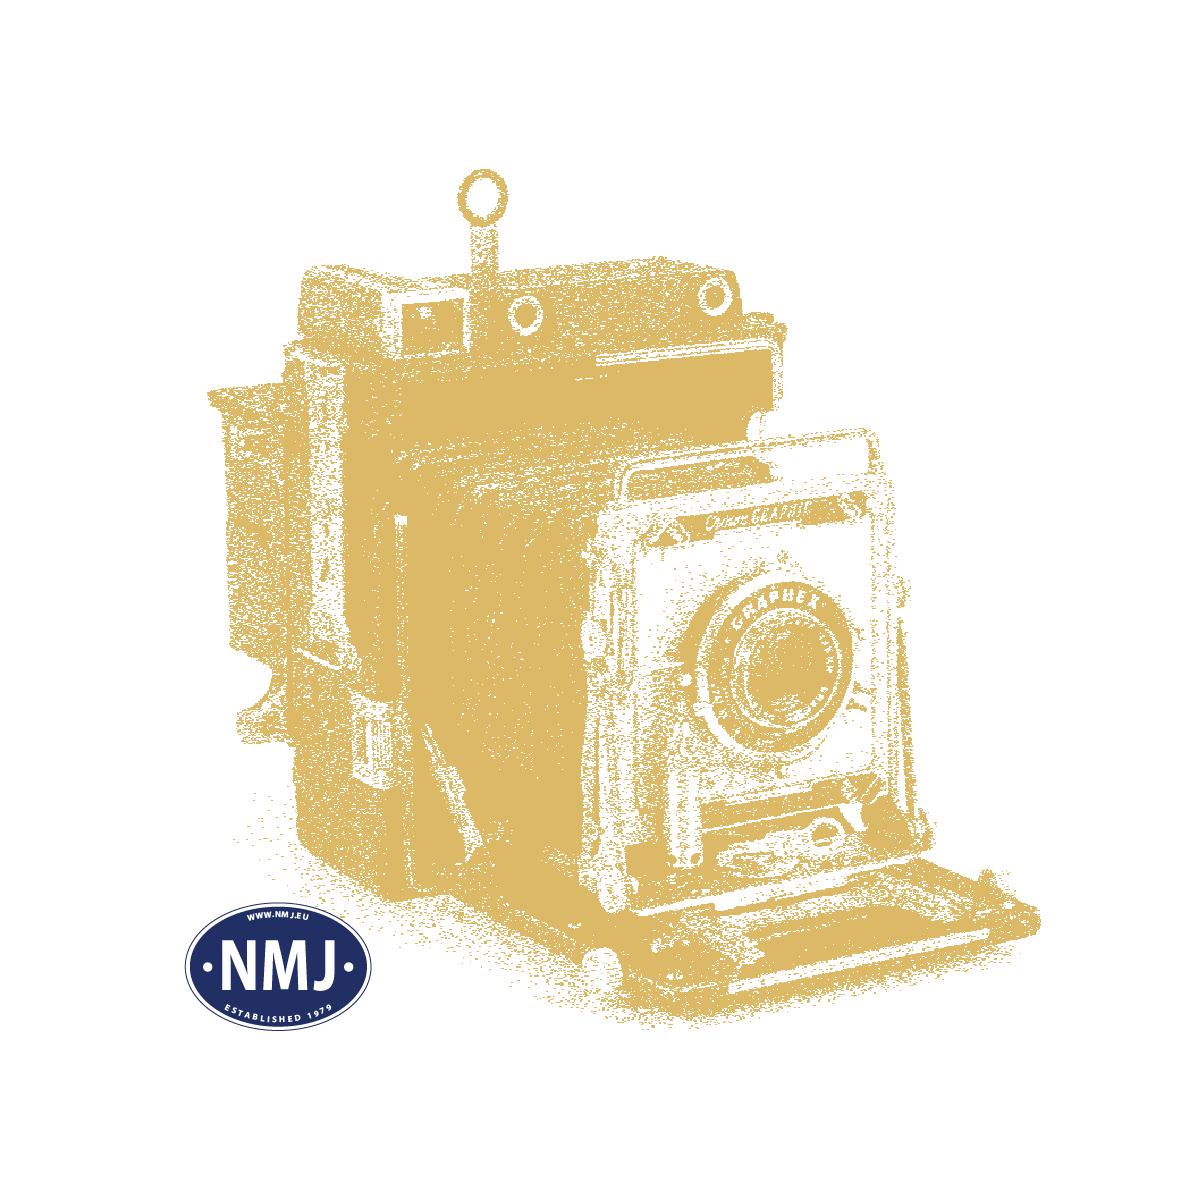 NMJT132.102 - NMJ Topline NSB B4 25955, Gammeldesign, (rotbraun)